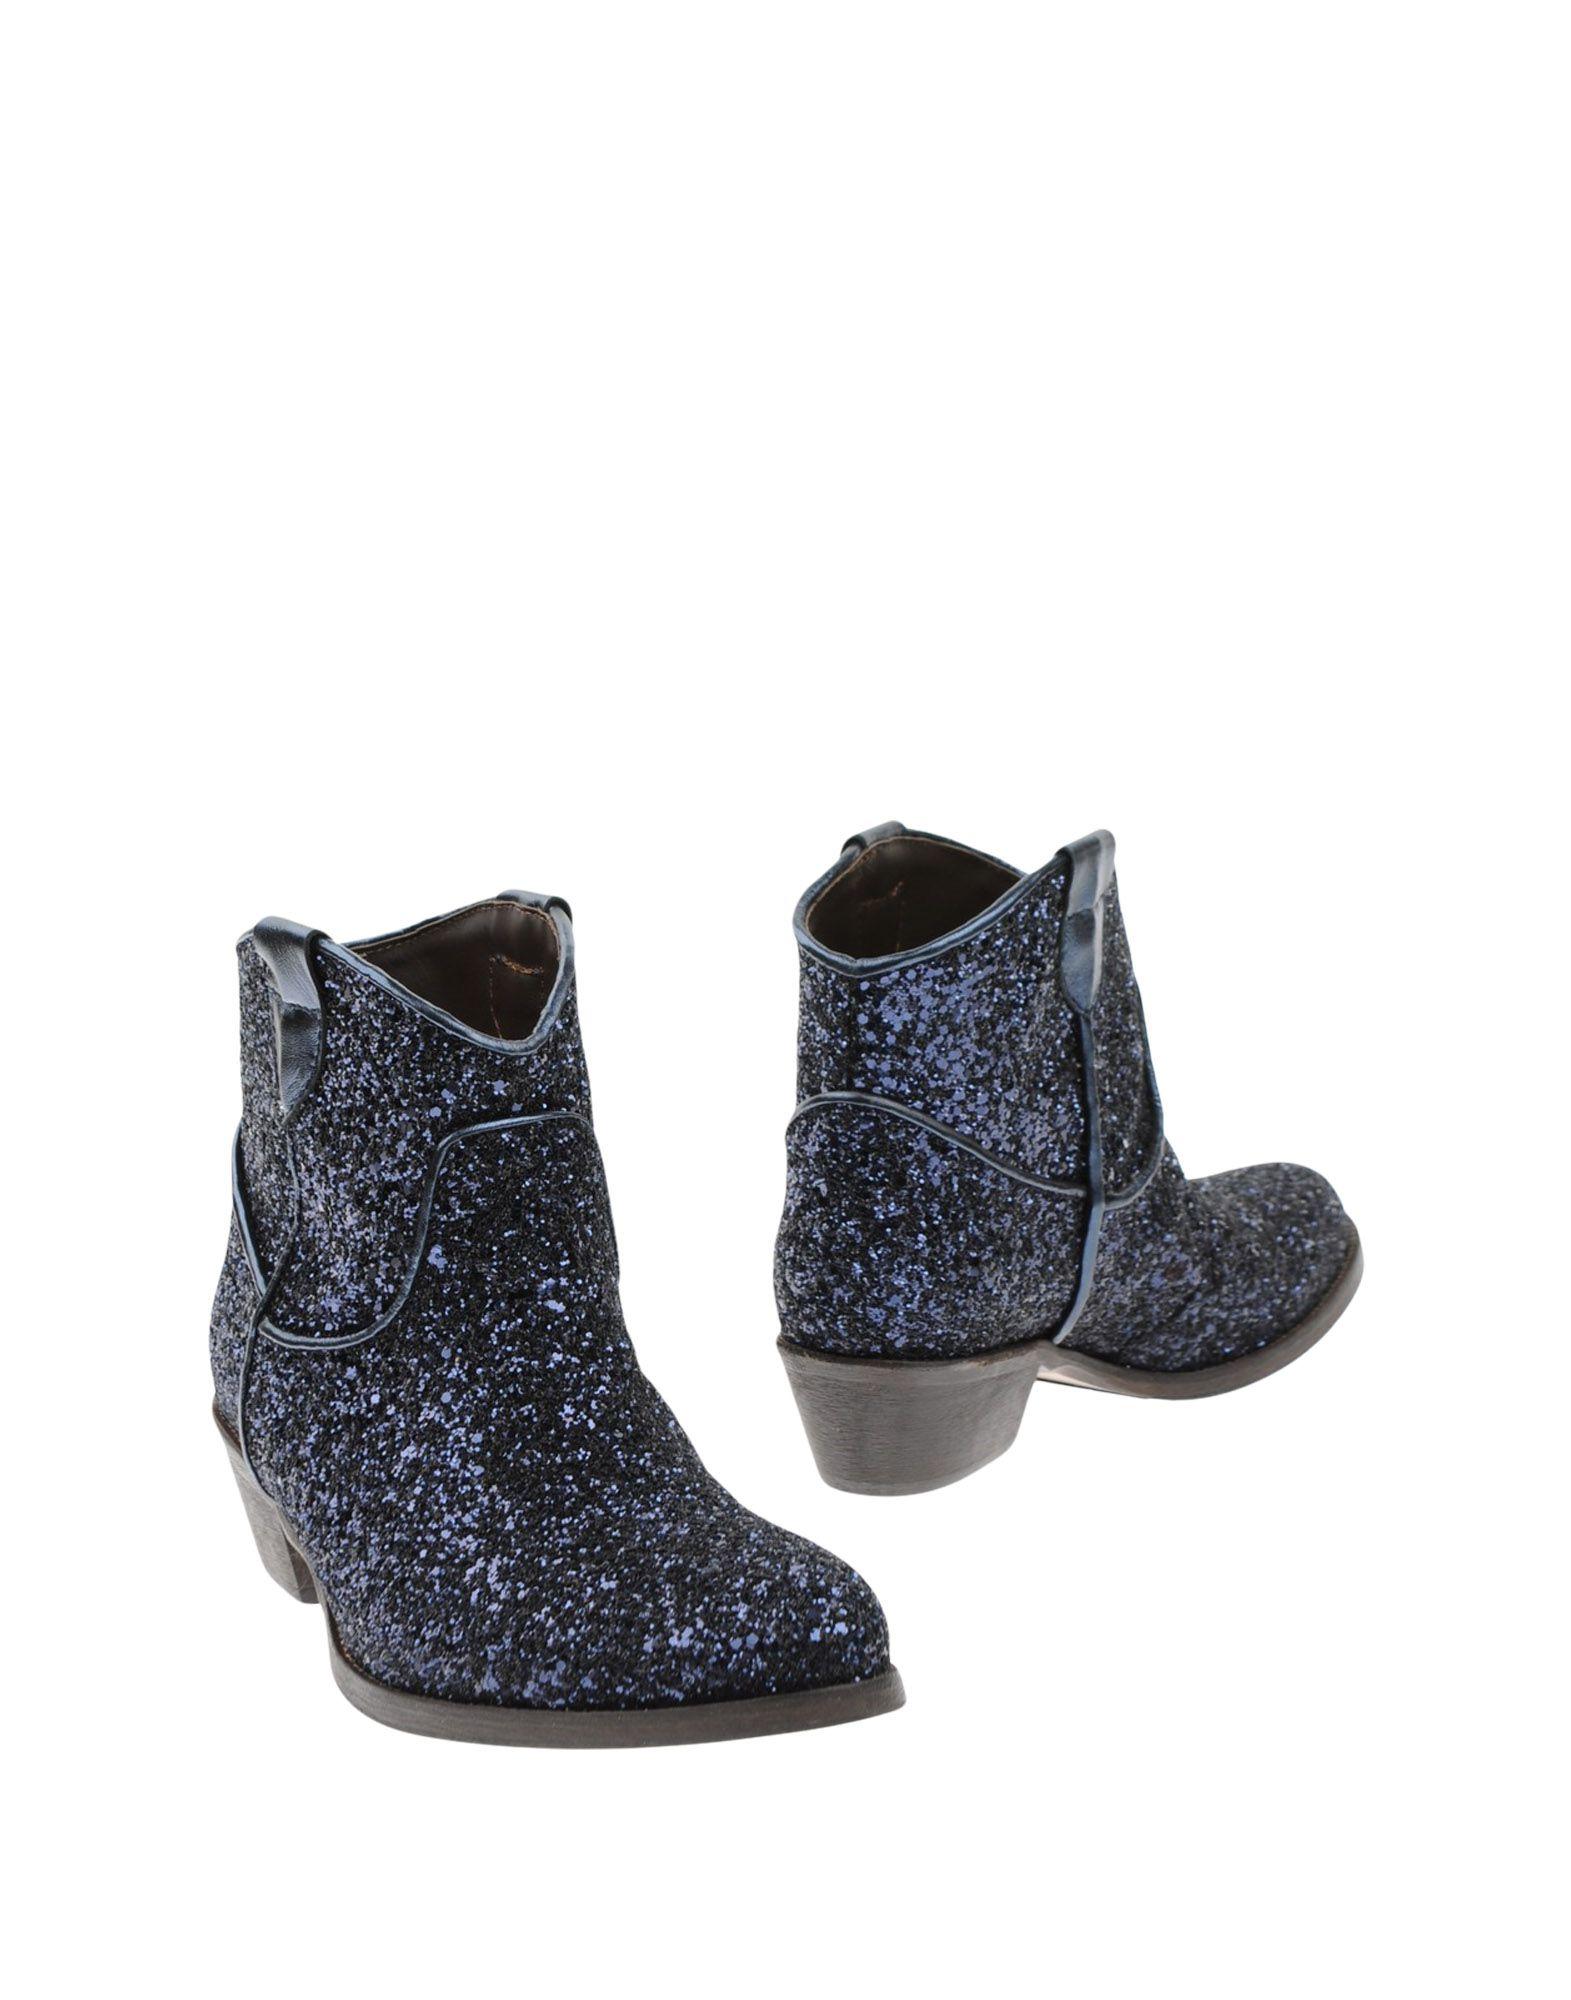 Stilvolle billige Schuhe Marco Venezia Stiefelette Damen  11232115SH